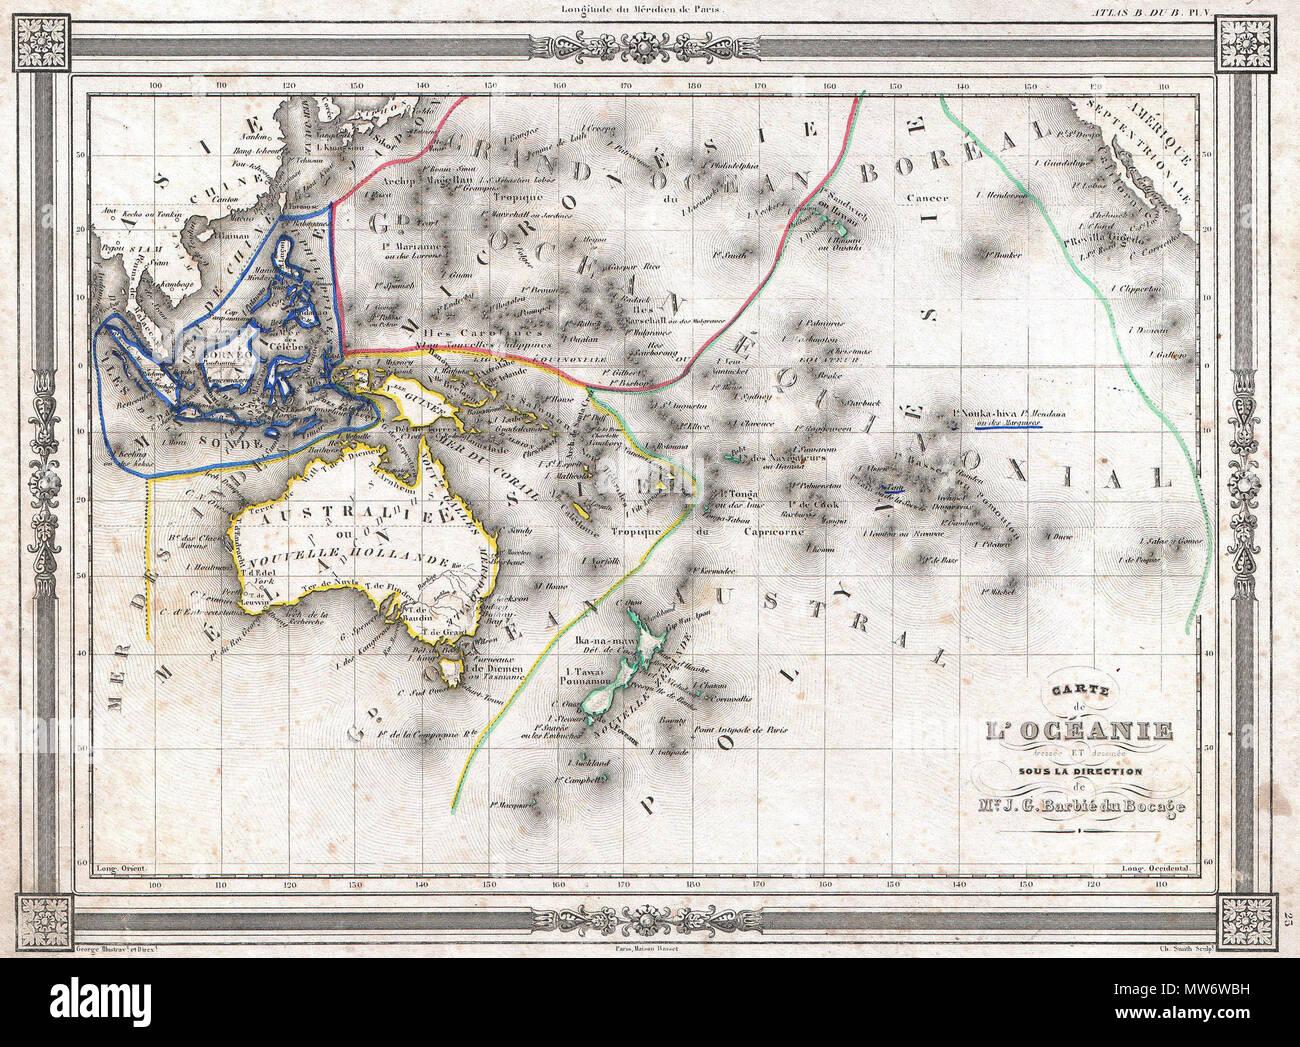 Carte Australie Malaisie.Bocage Map Of Australia And Polynesia Photos Bocage Map Of